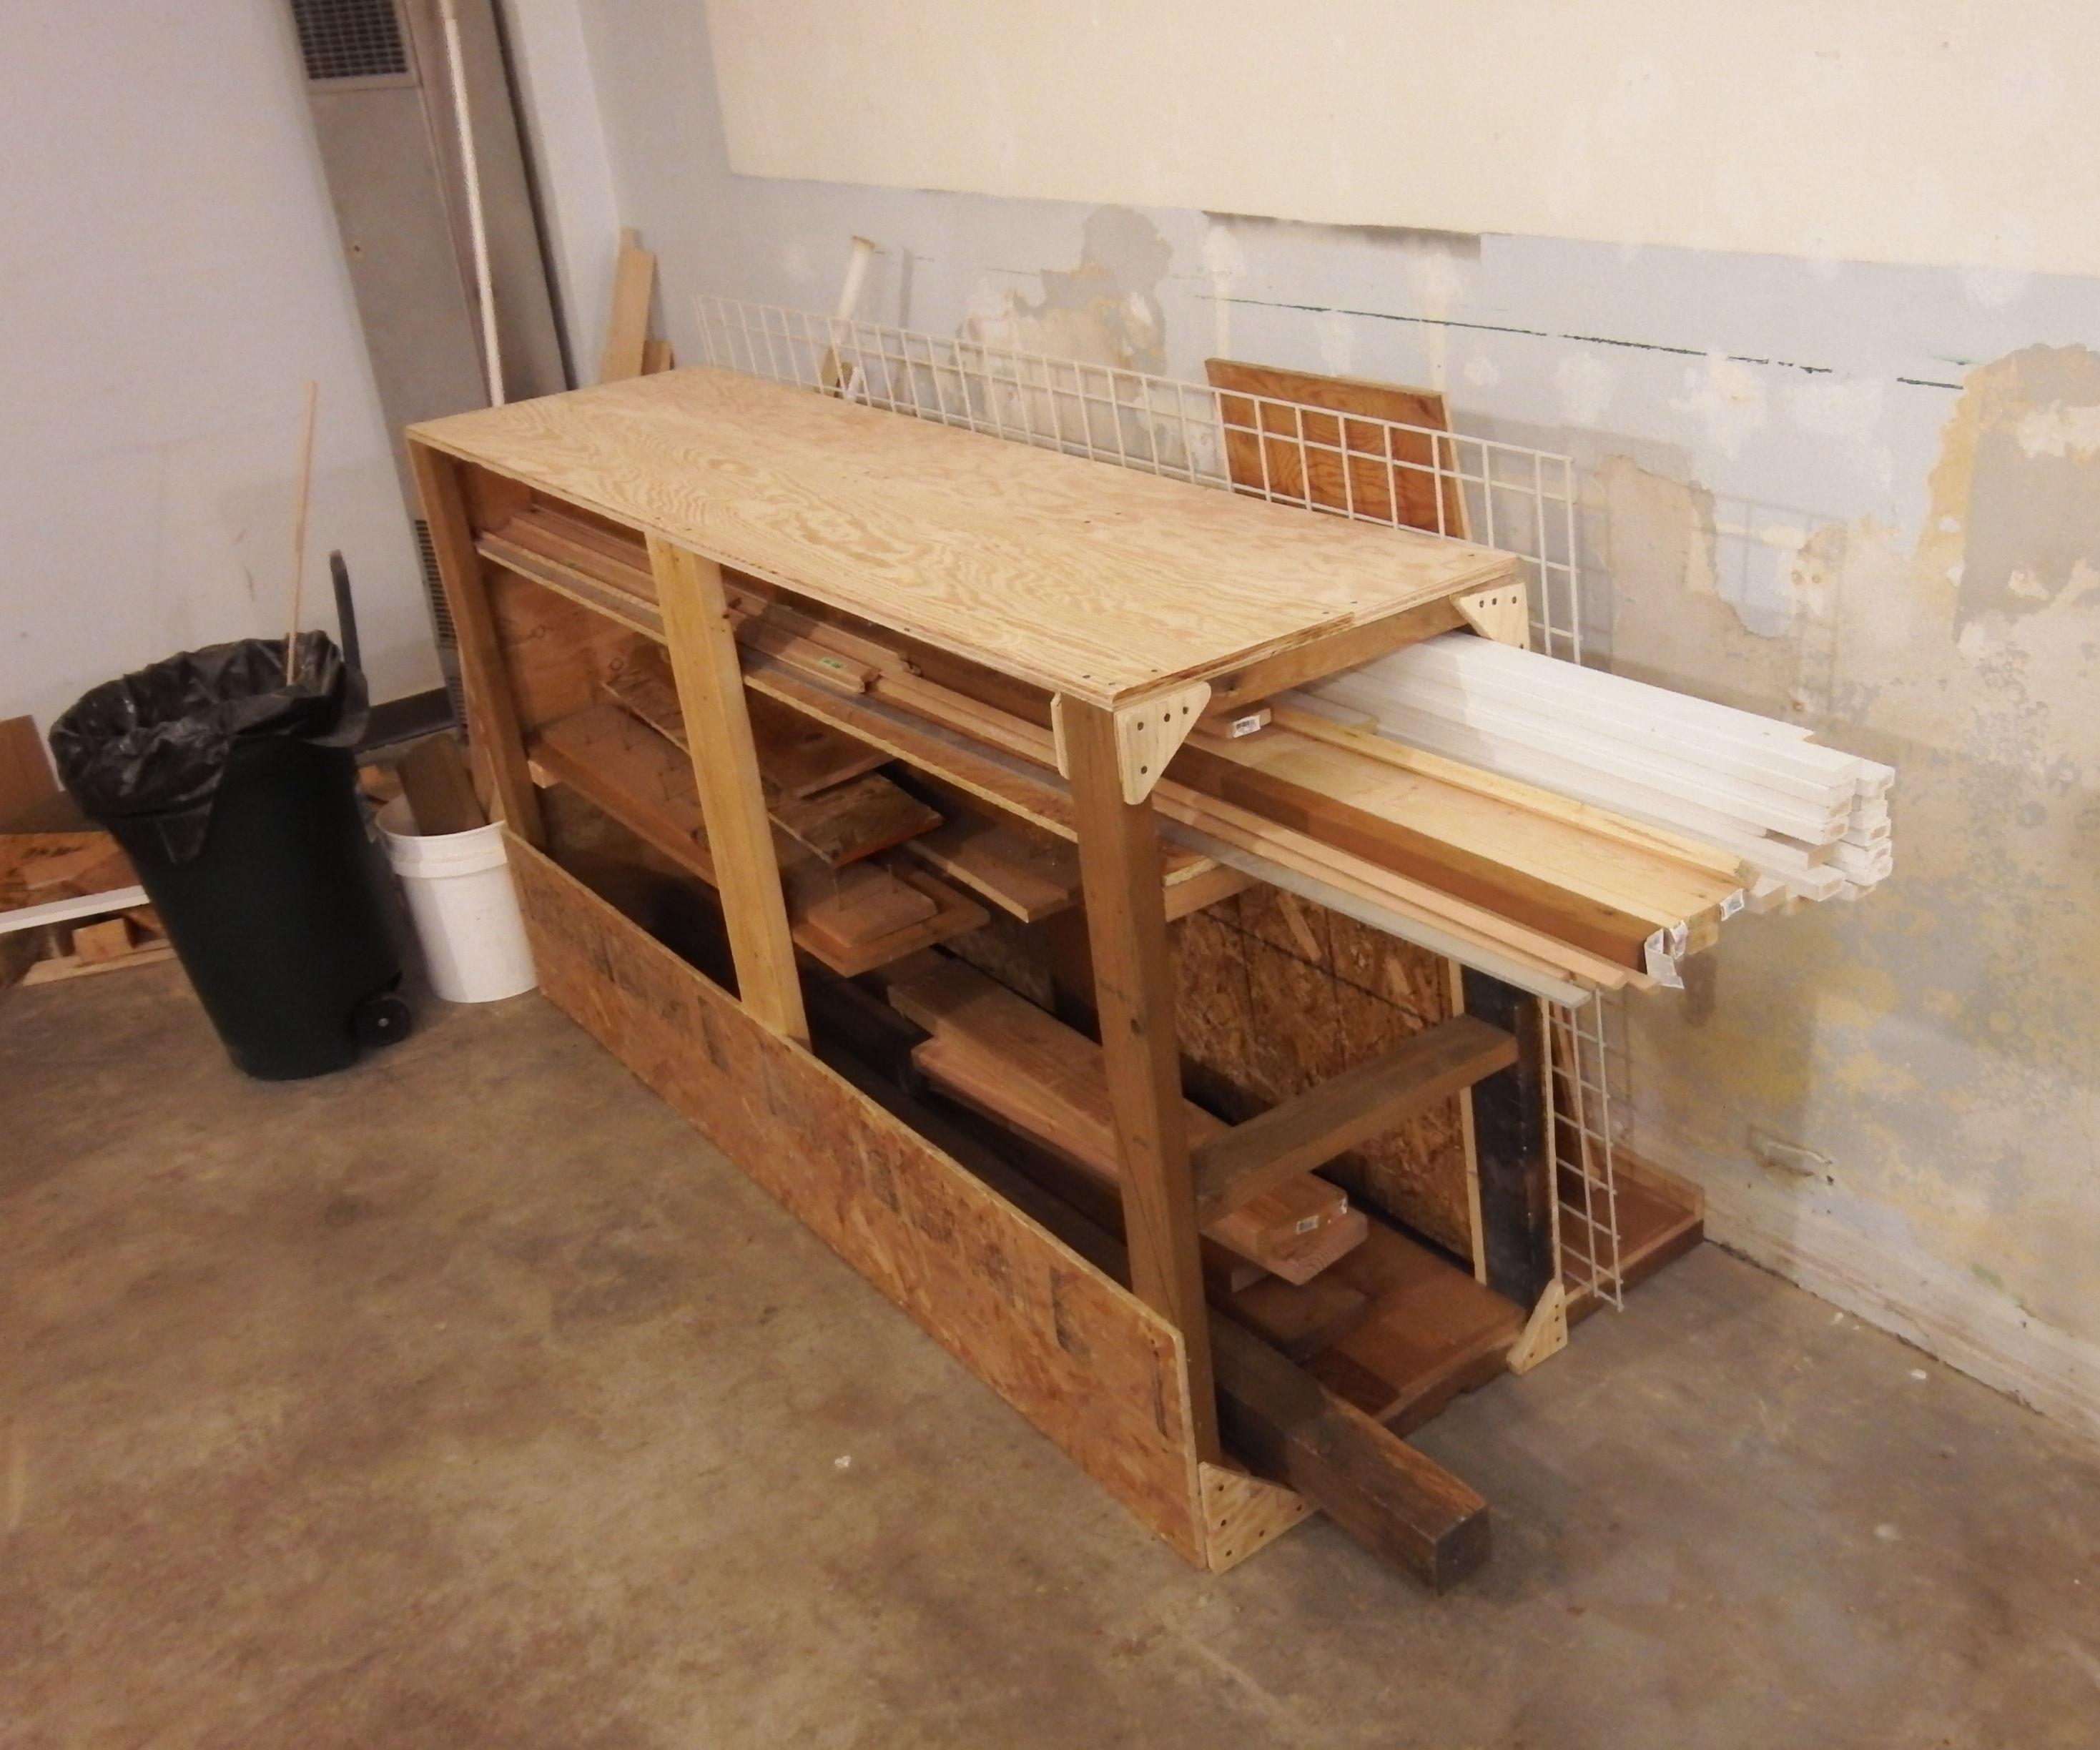 lumber storage rack made from scrap 3